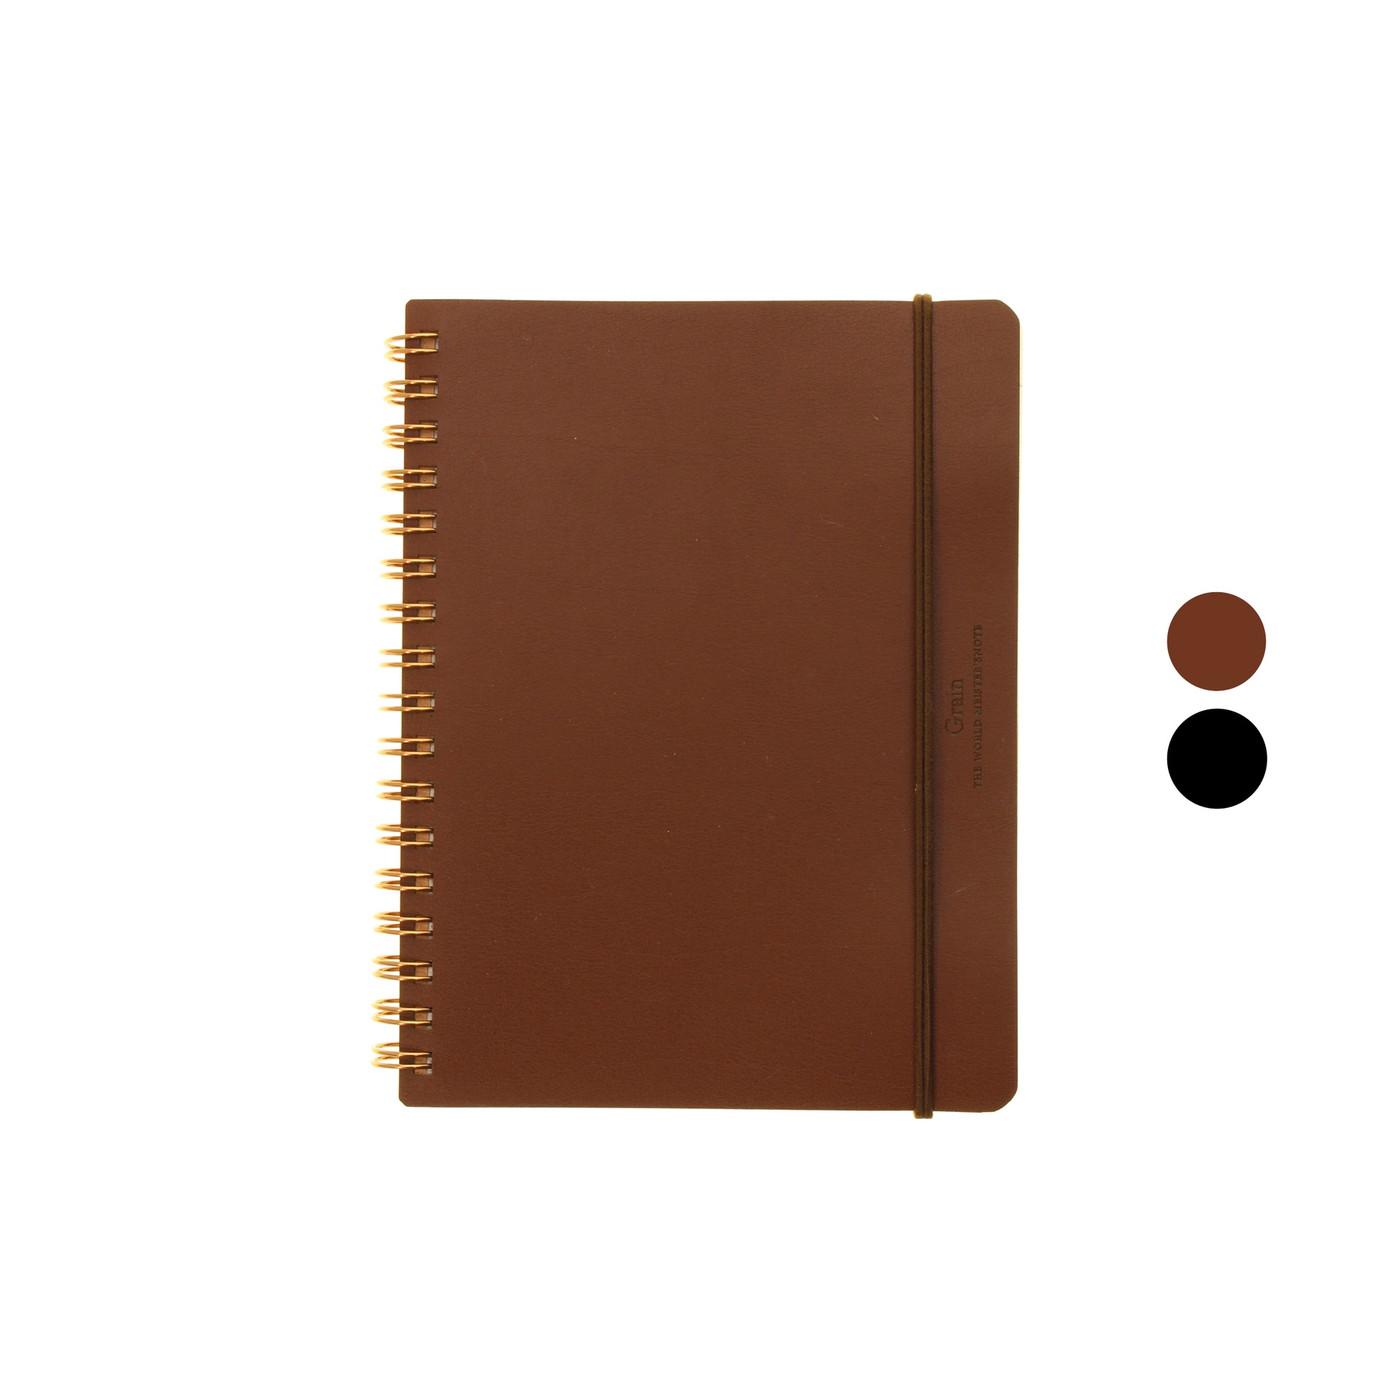 Midori Grain notebook - B6 LINED / BLANK